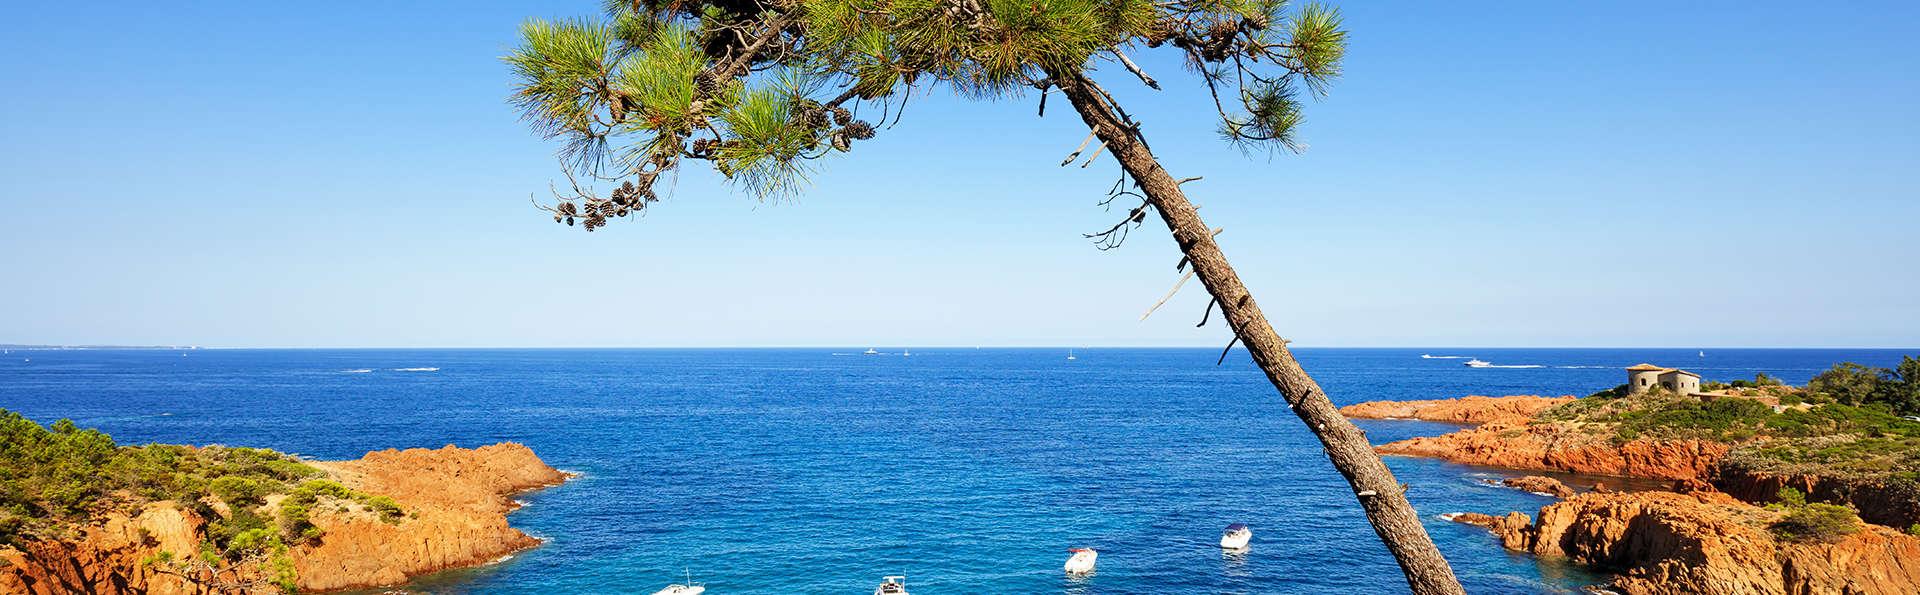 Coralia By Vacancéole  Résidence Carré Marine - Edit_Cannes.jpg